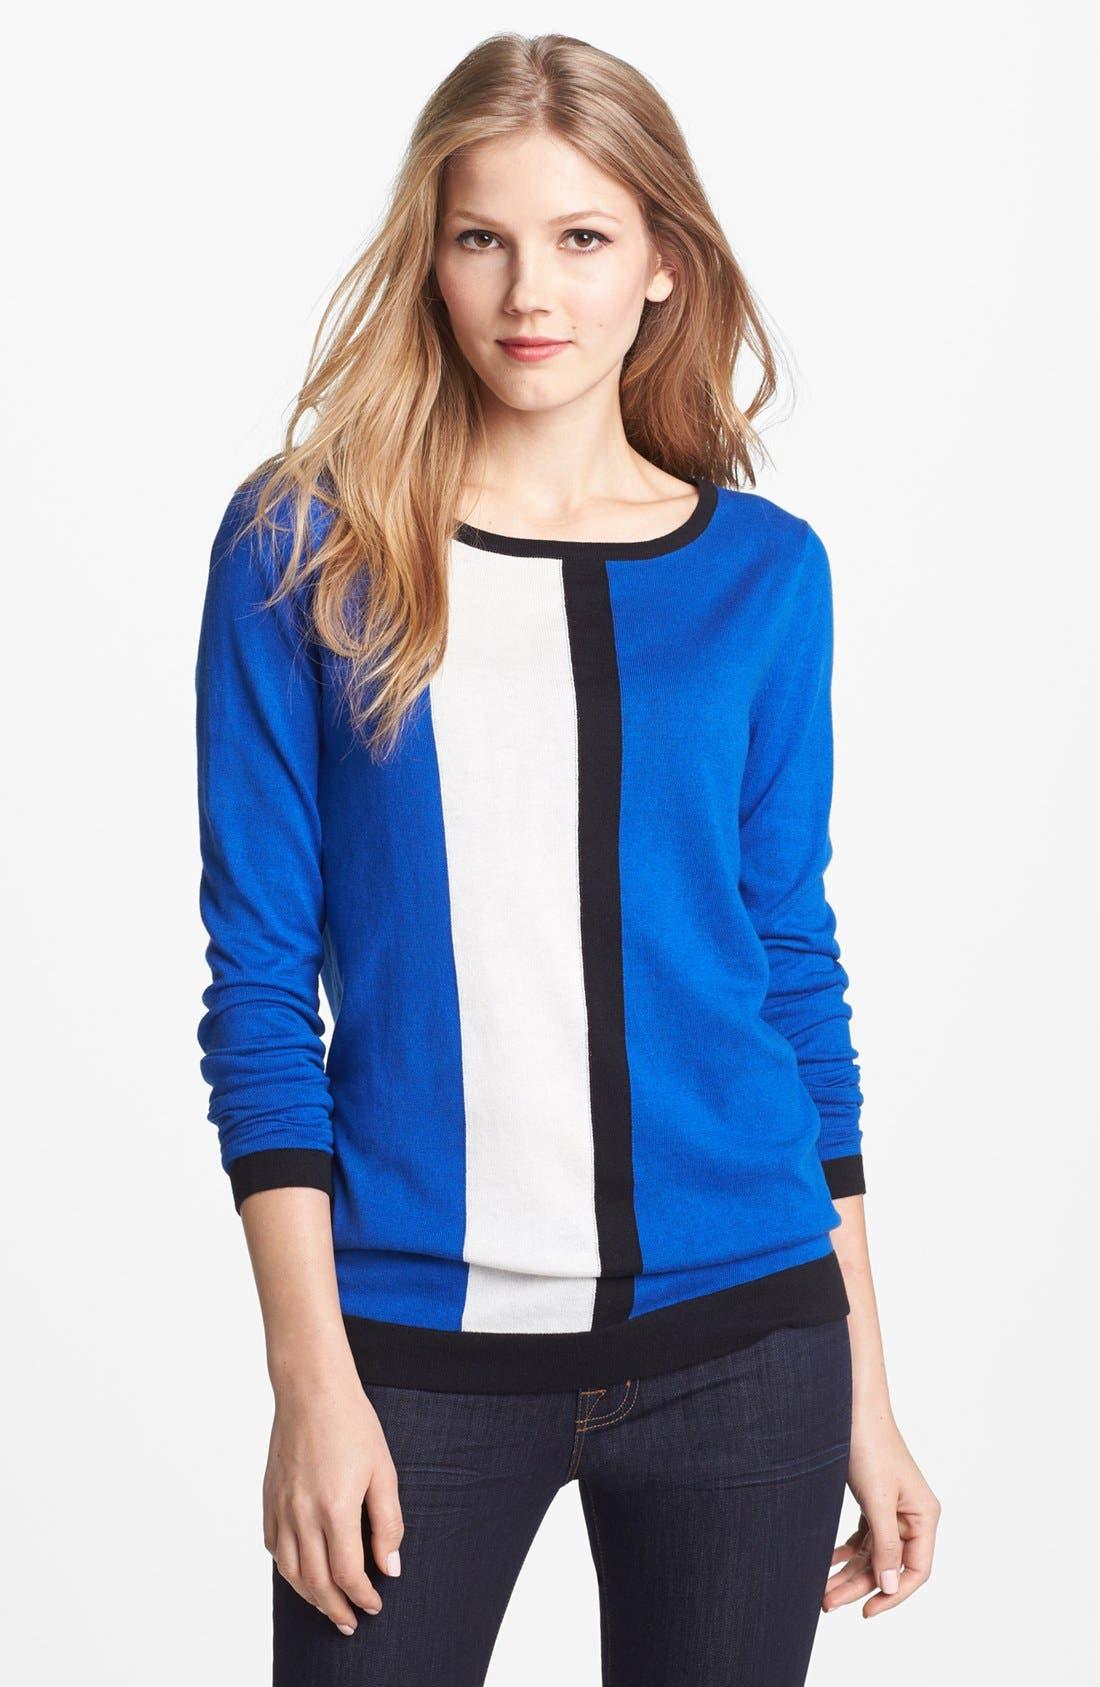 Main Image - Vince Camuto Vertical Stripe Colorblock Cotton Blend Sweater